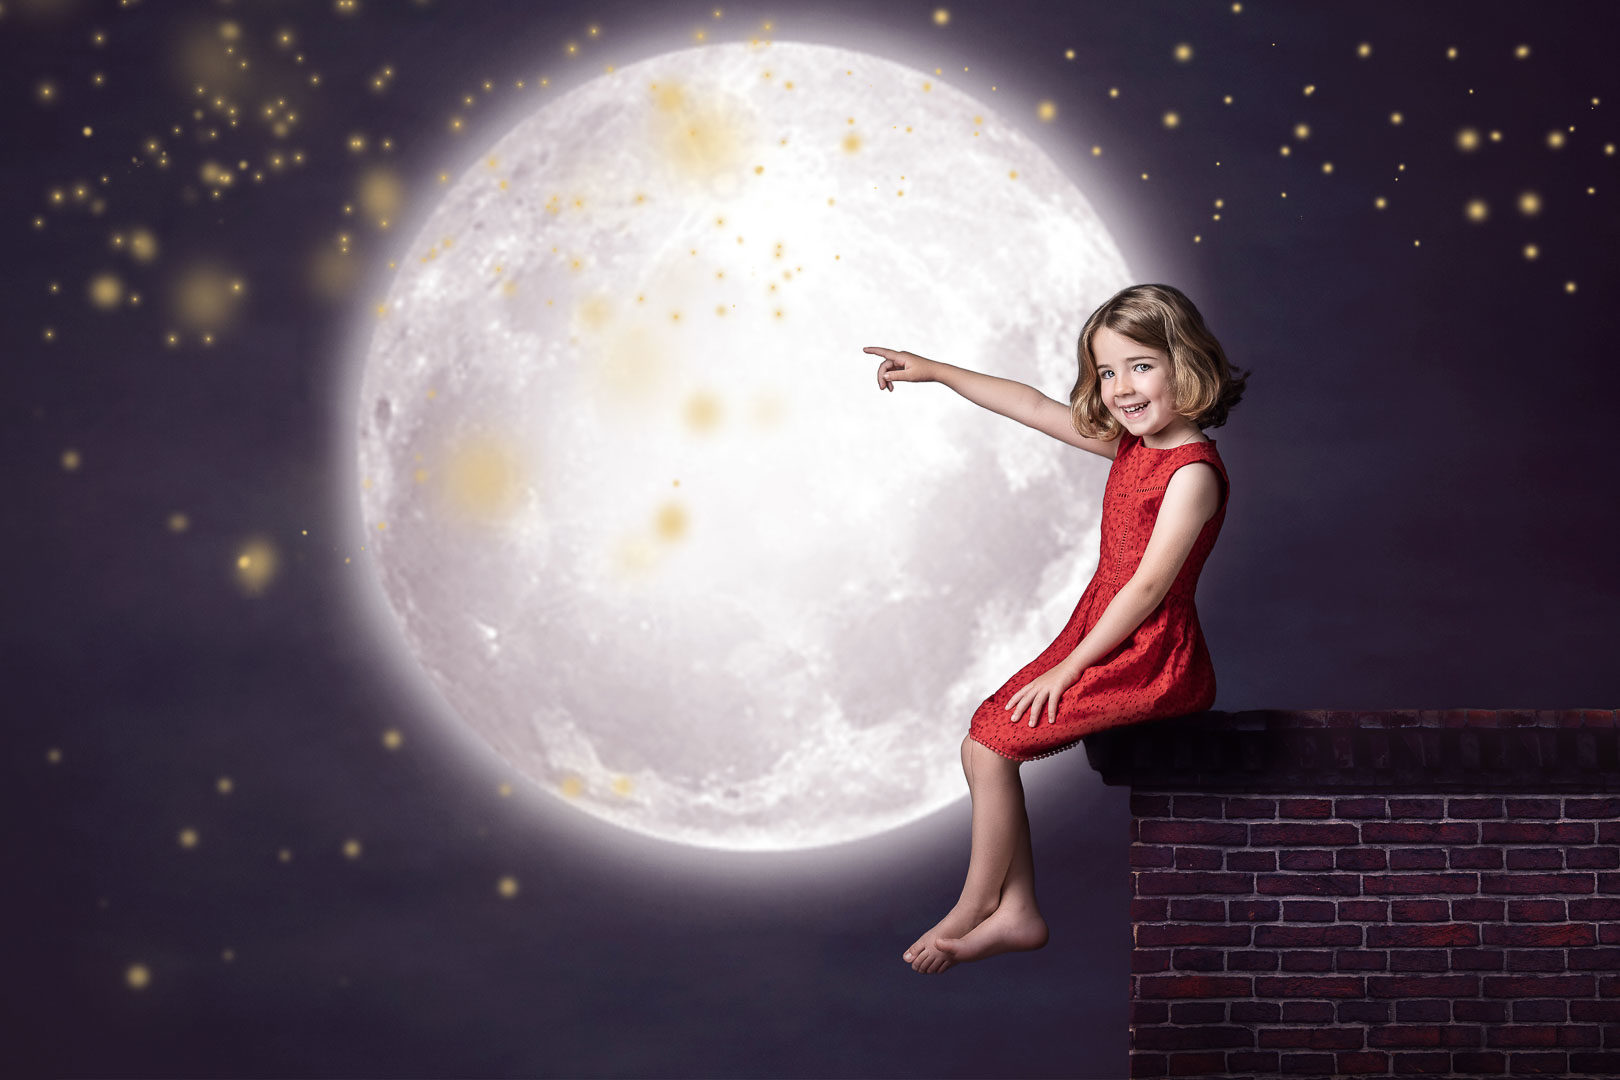 imagen-fotografia-infantil-bebe-estudio-zaragoza-fotografo-roberto-montorio-fotografa-alejandra-lacosta 20